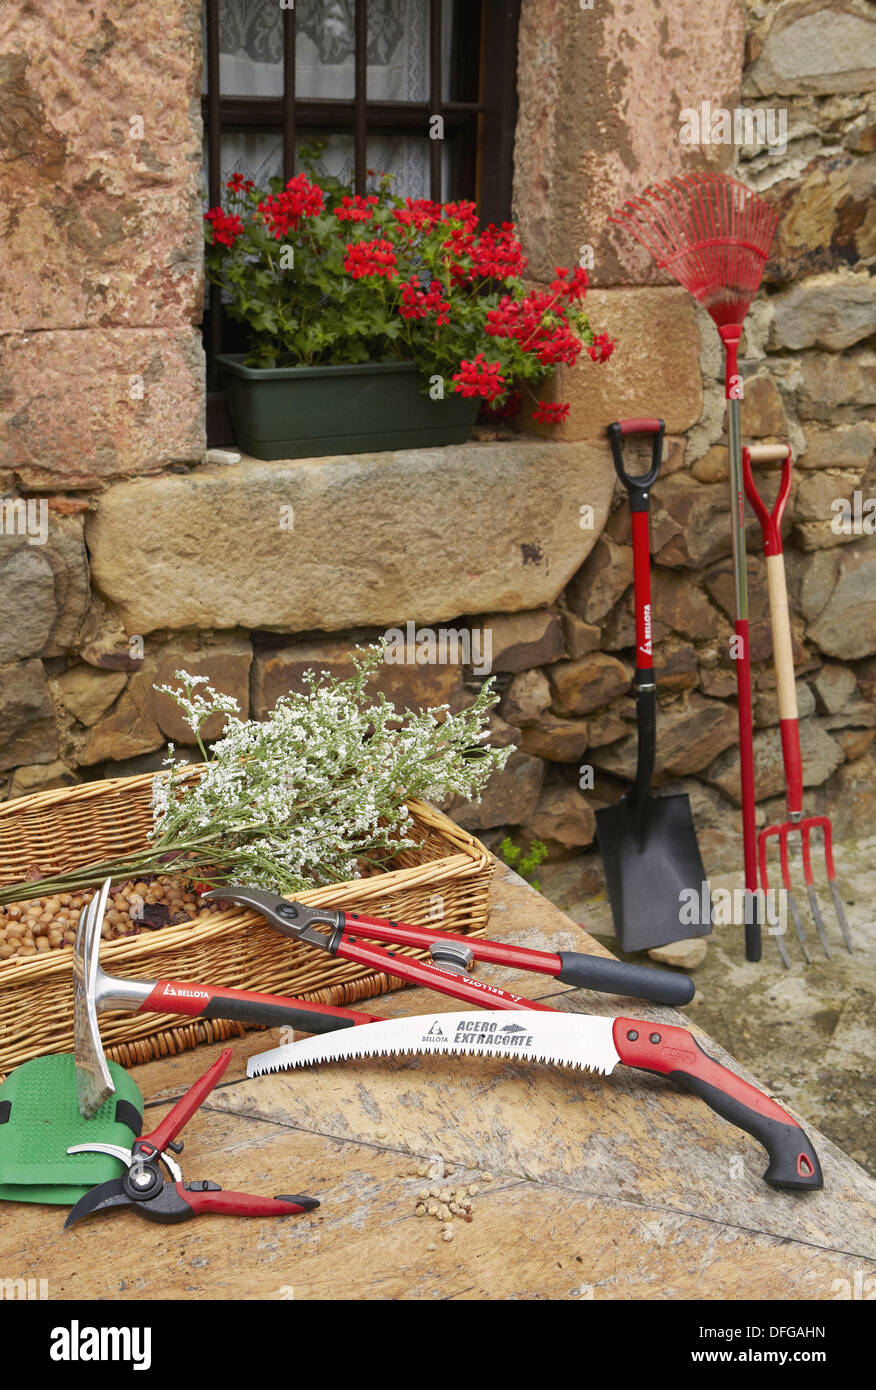 farming tools stockfotos farming tools bilder alamy. Black Bedroom Furniture Sets. Home Design Ideas